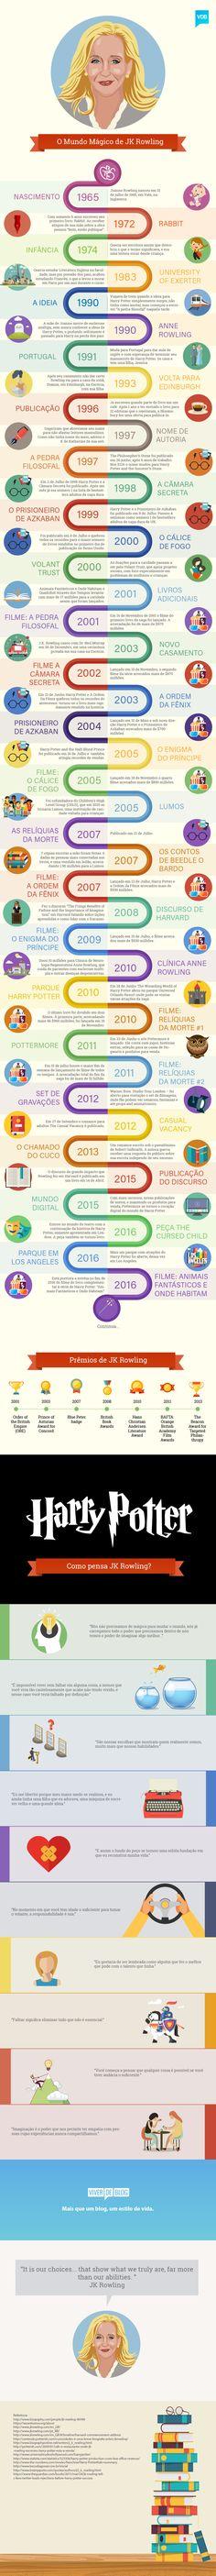 infografico-jk-rowling-3